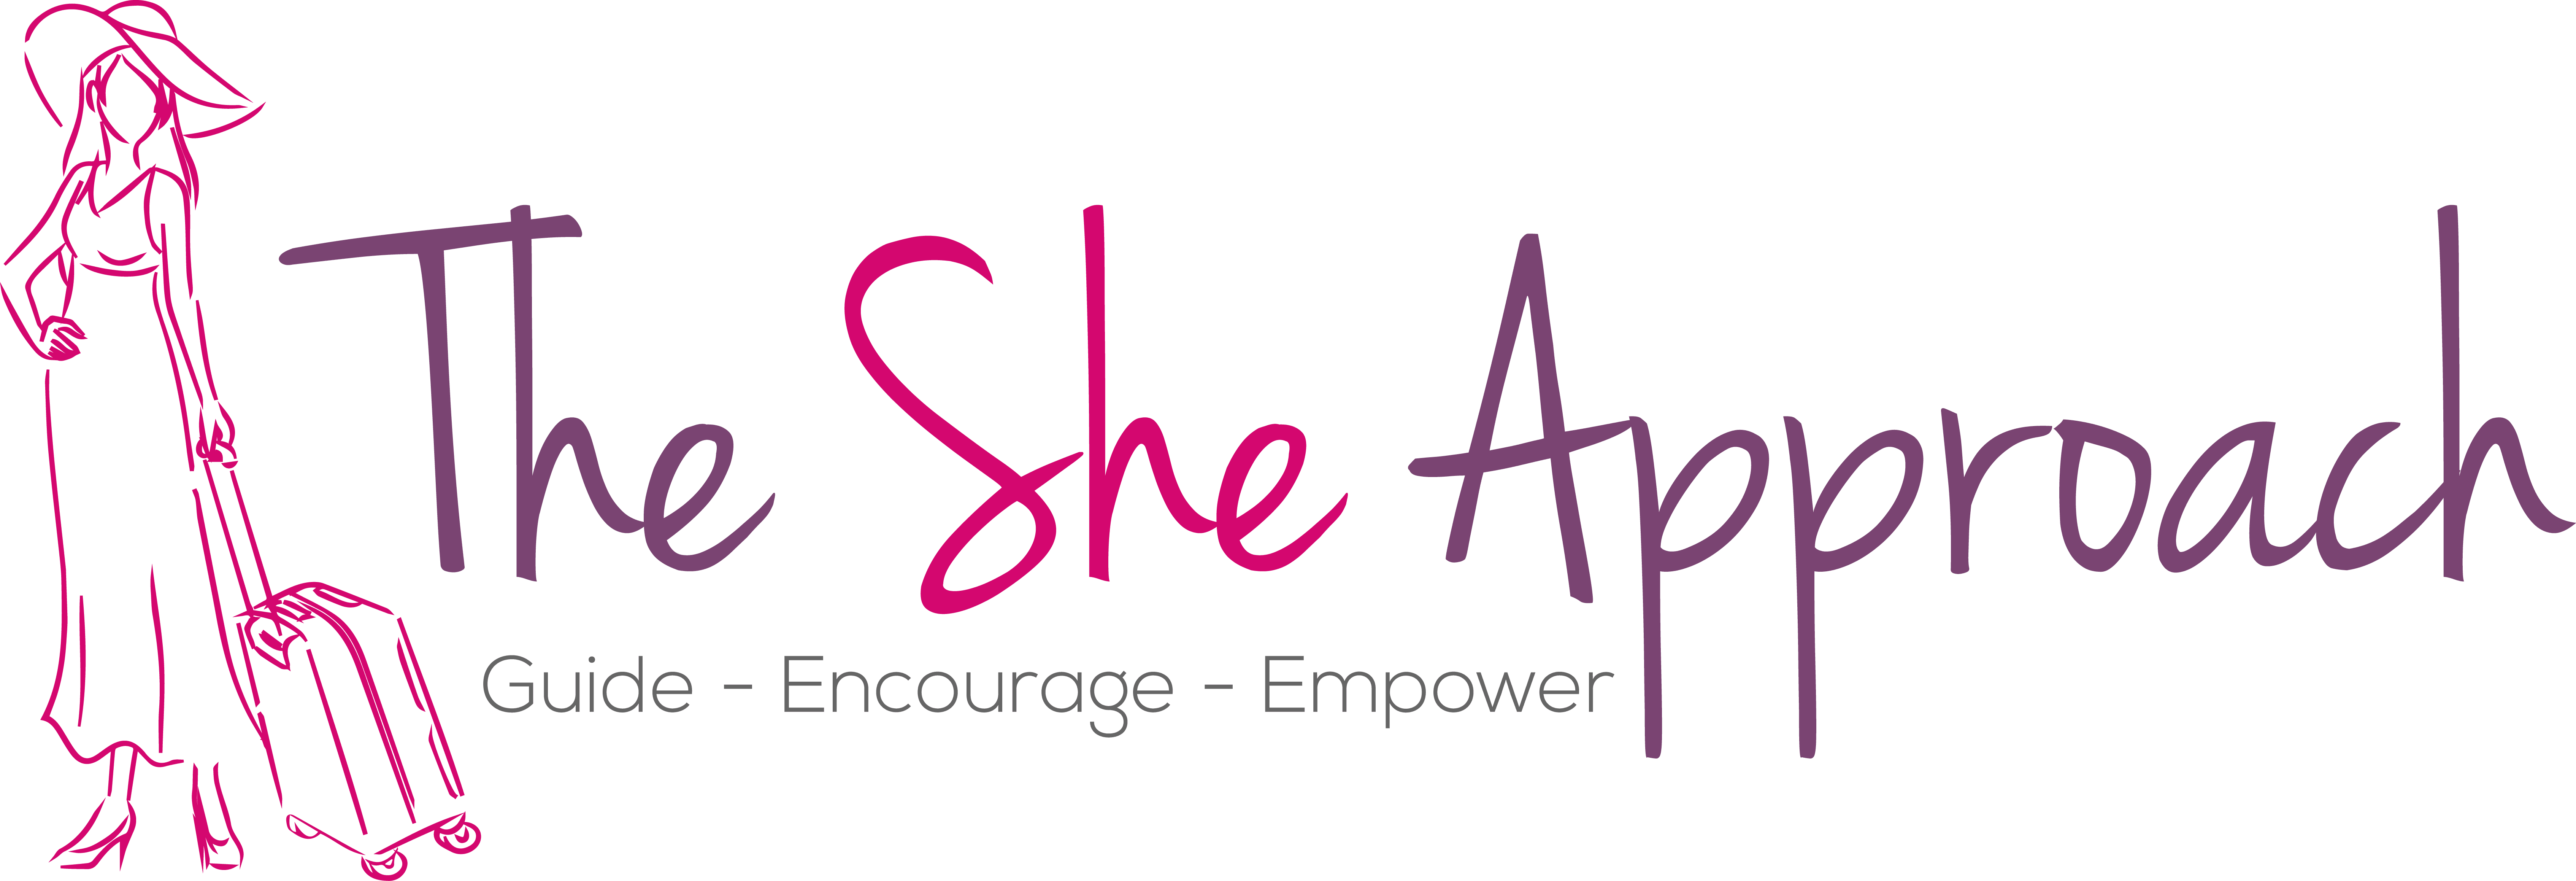 the_she_approach-fivver-logo-designer